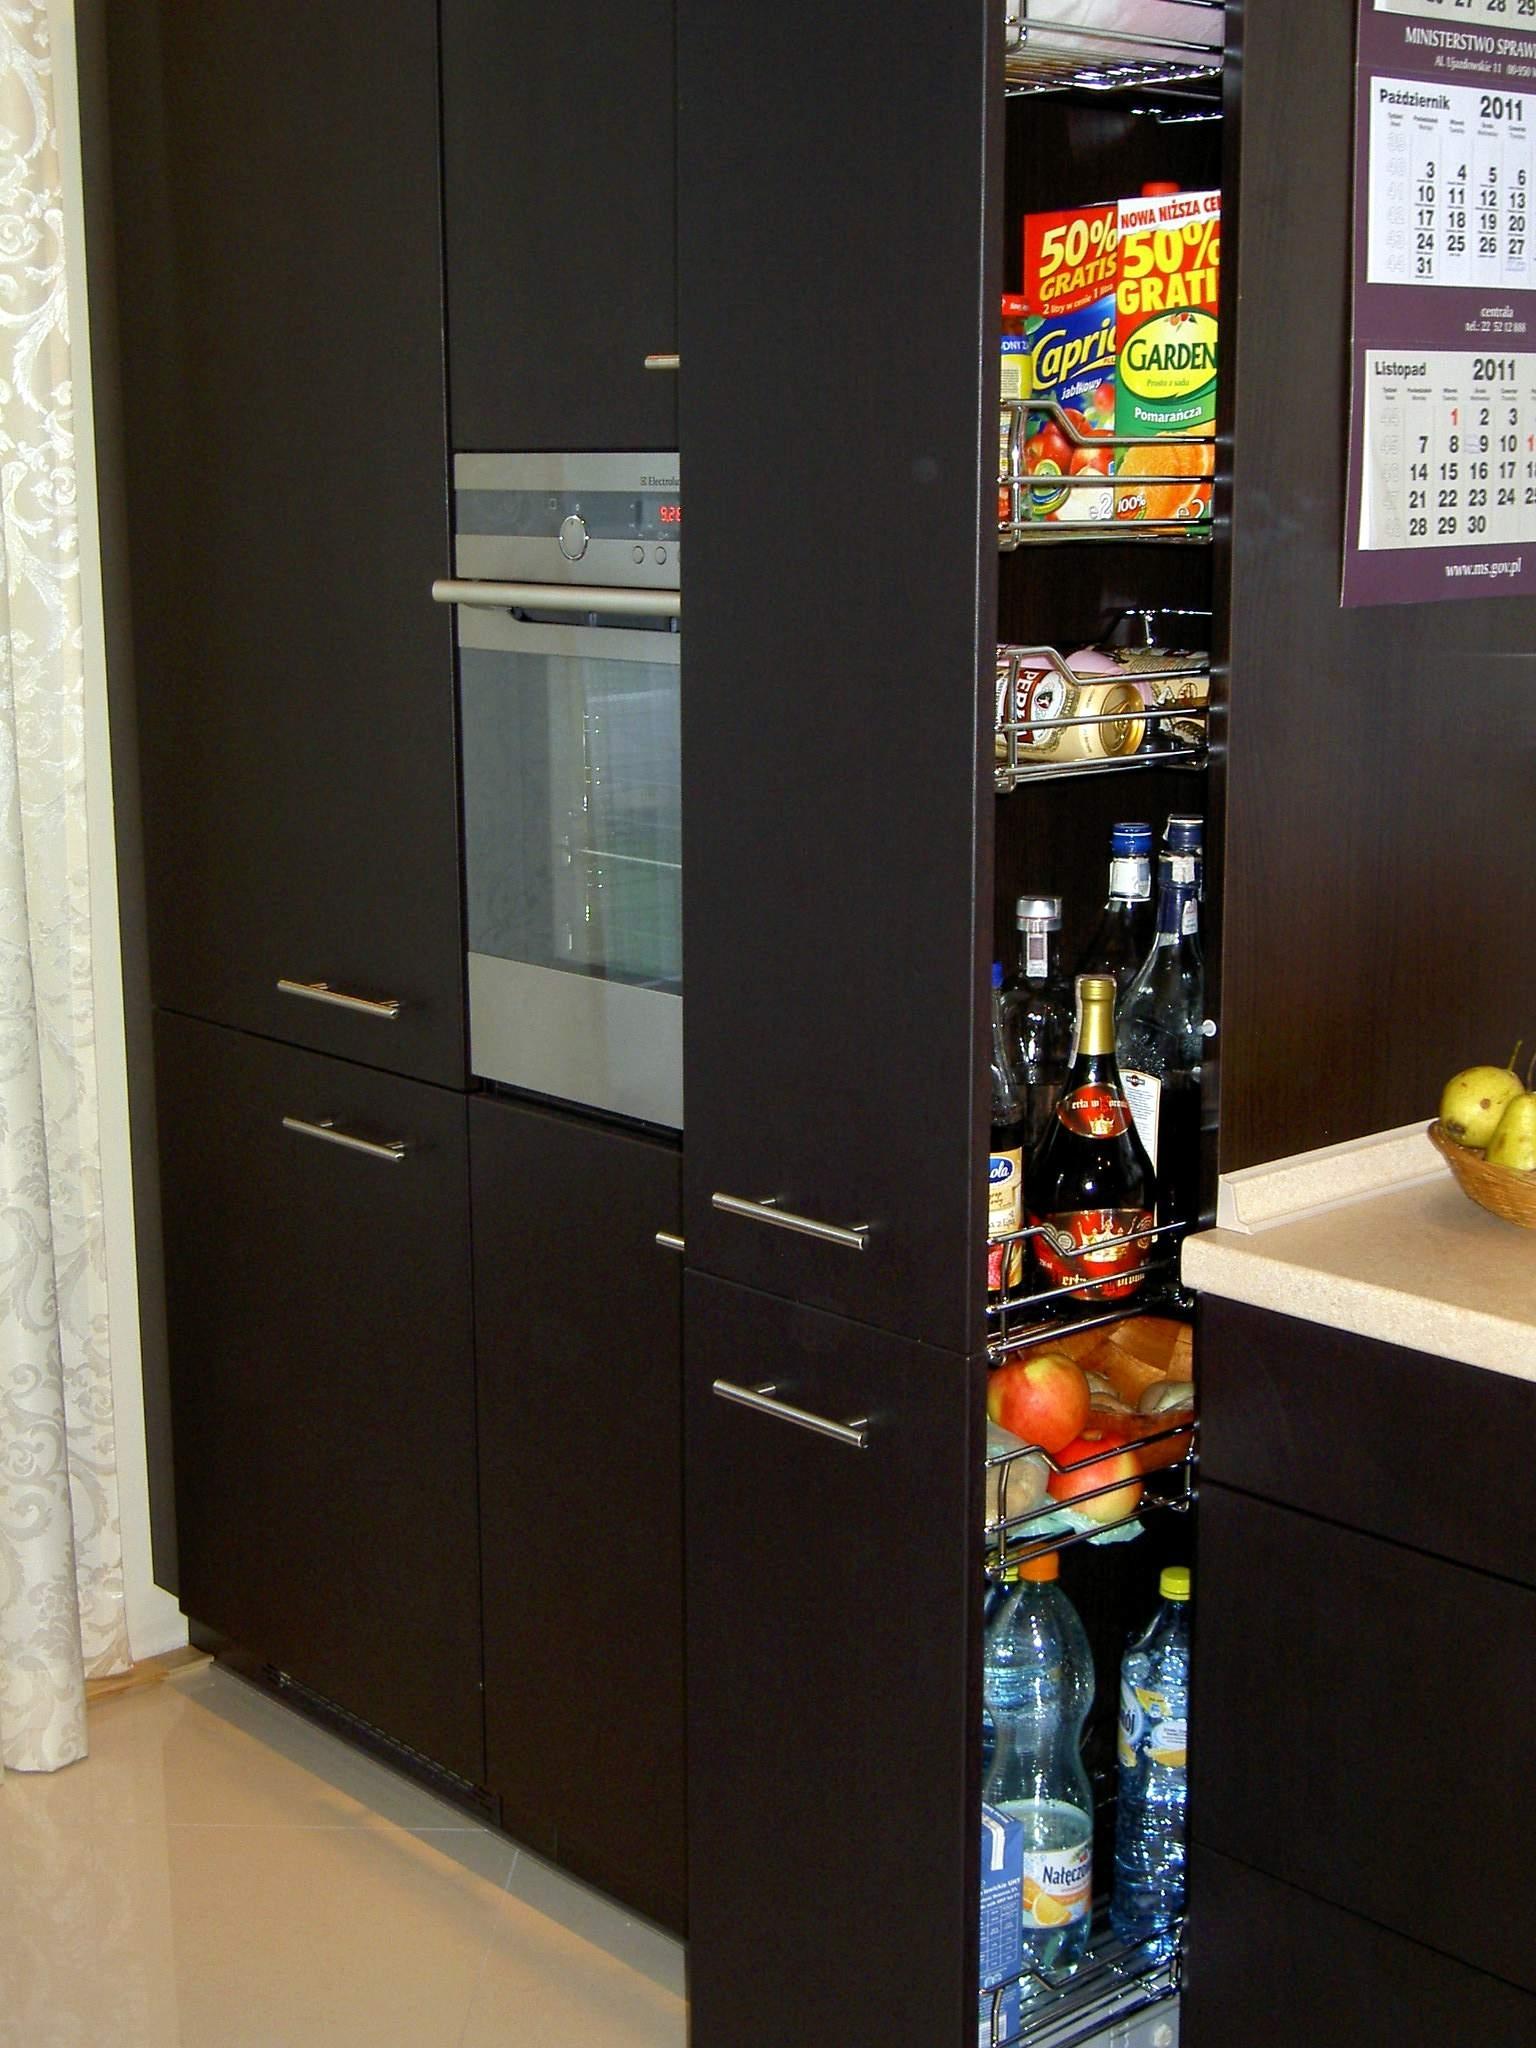 kuchnie wenge galeria, kuchnie z salonem, kuchnie projekty galeria